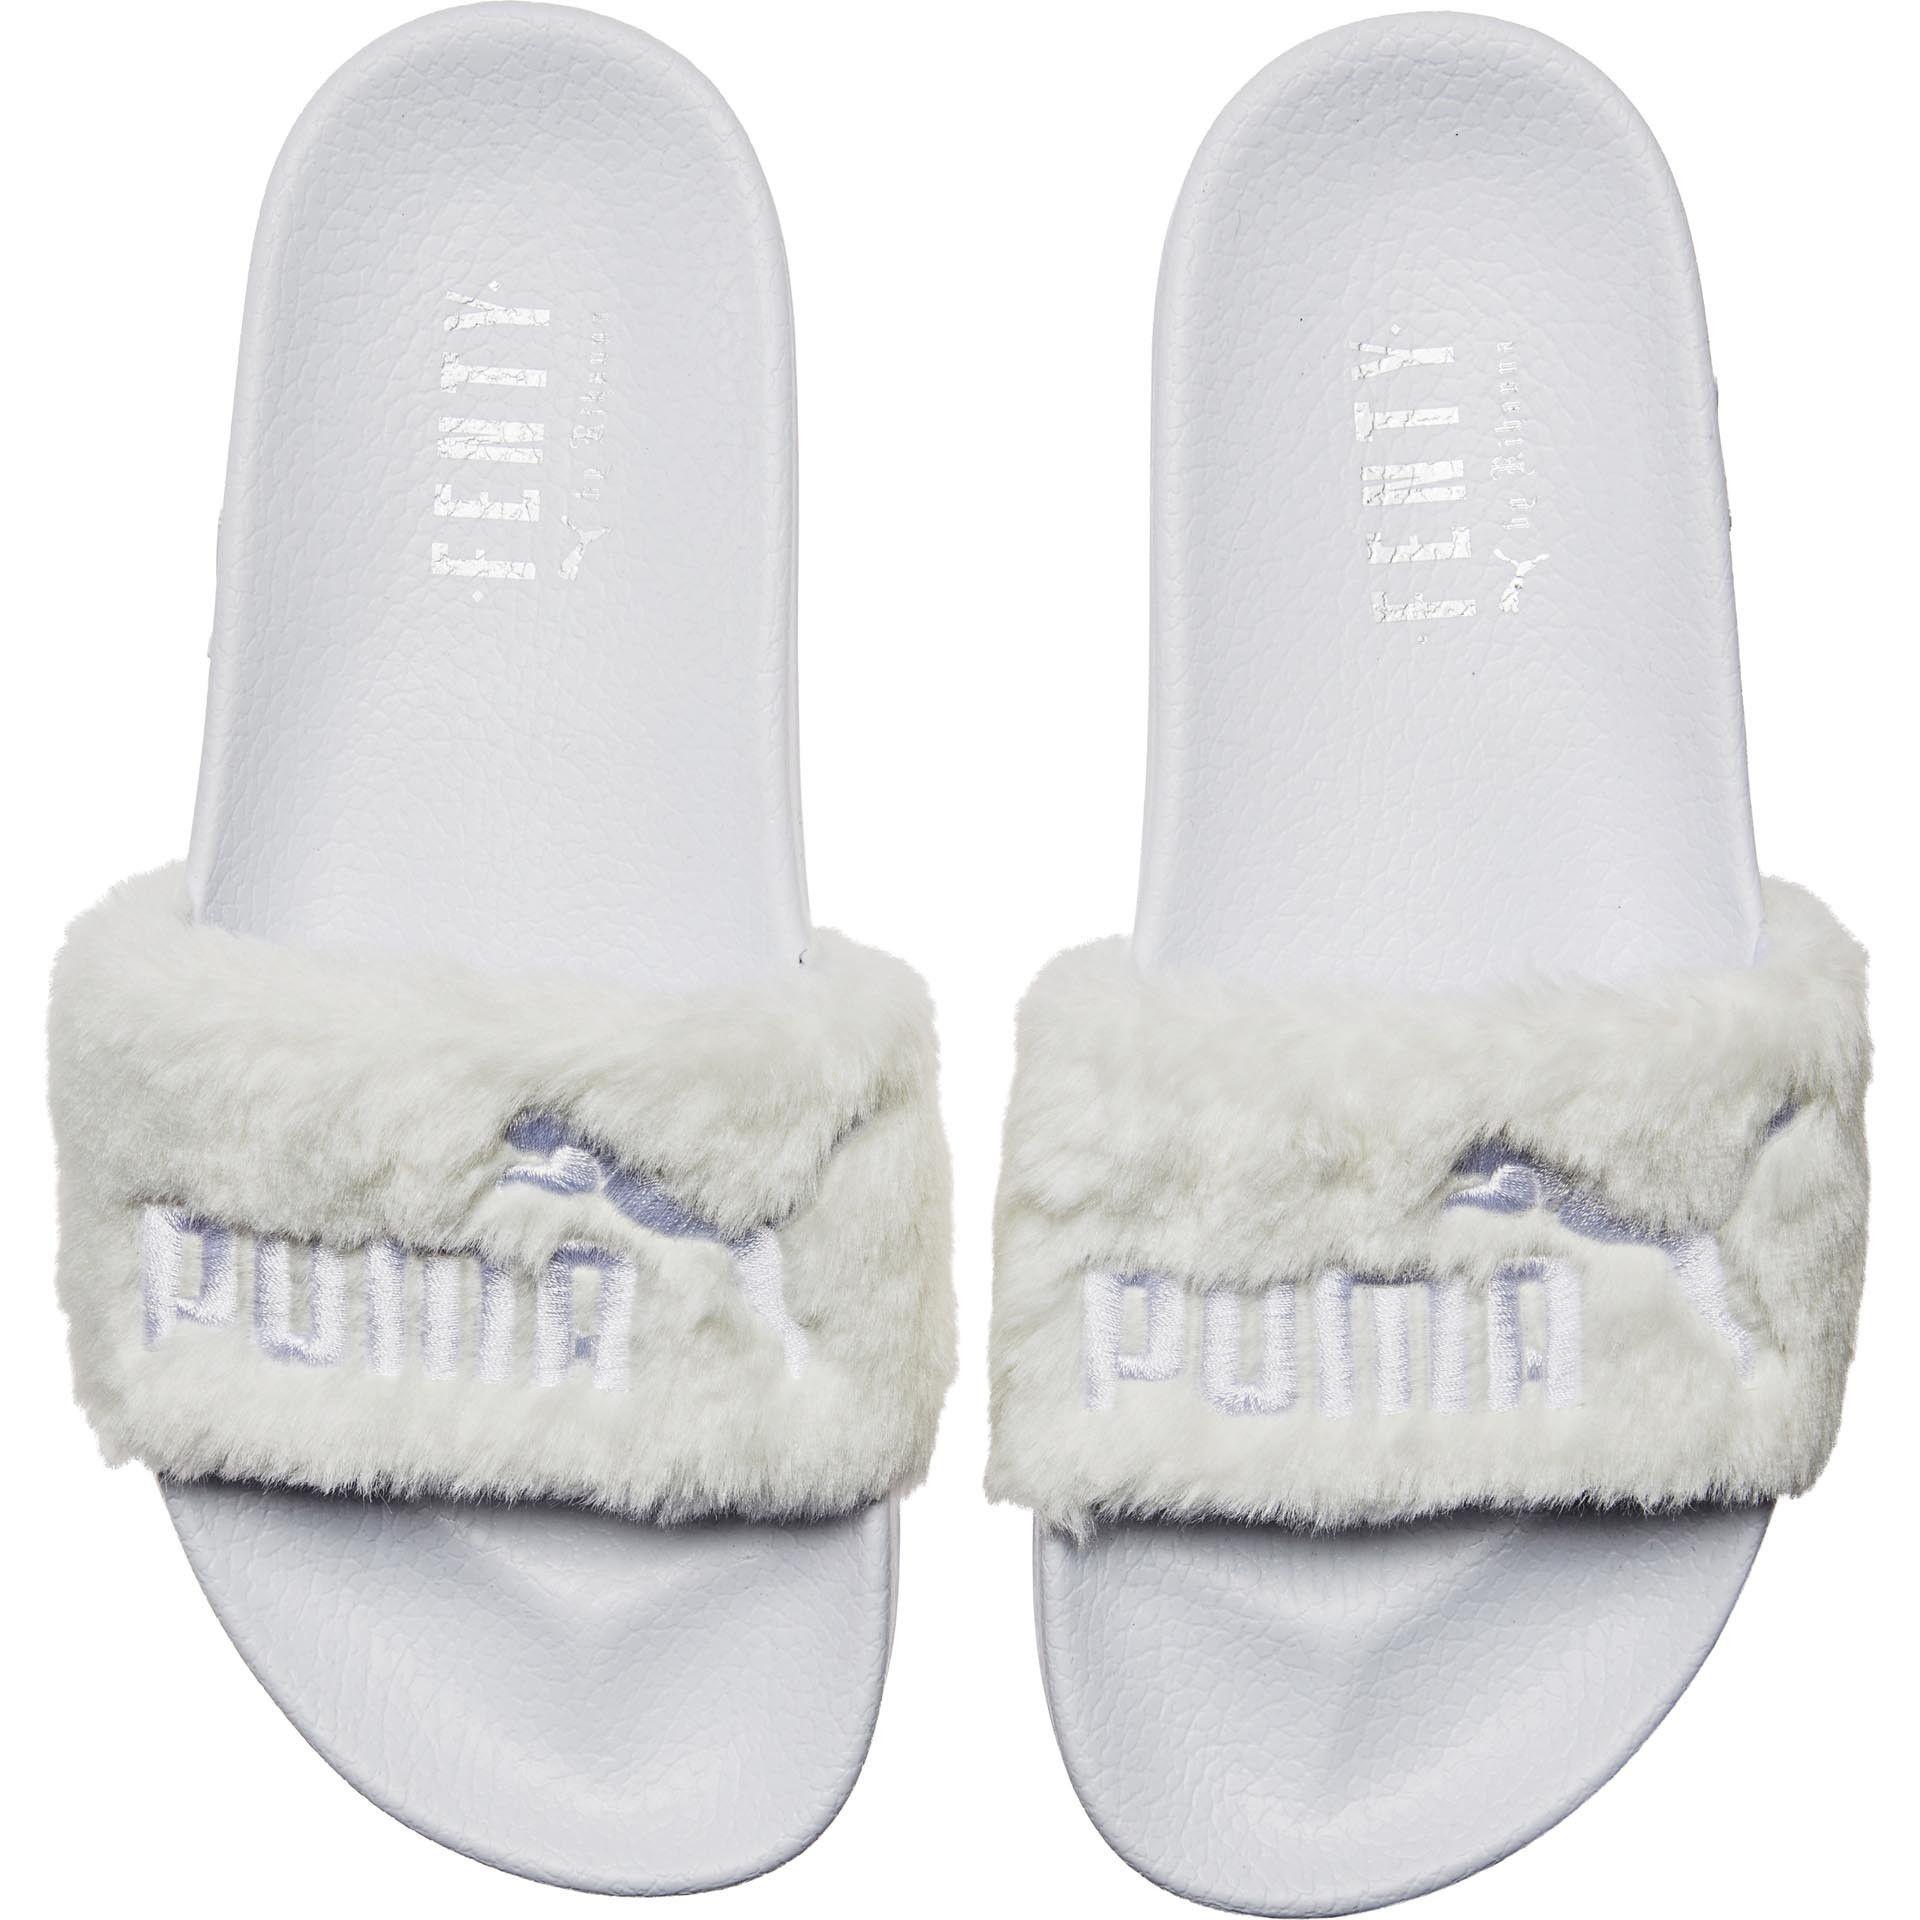 super popular 74299 a7468 Puma LeadCat Fenty Slide White | Products | Shoes, Fashion ...